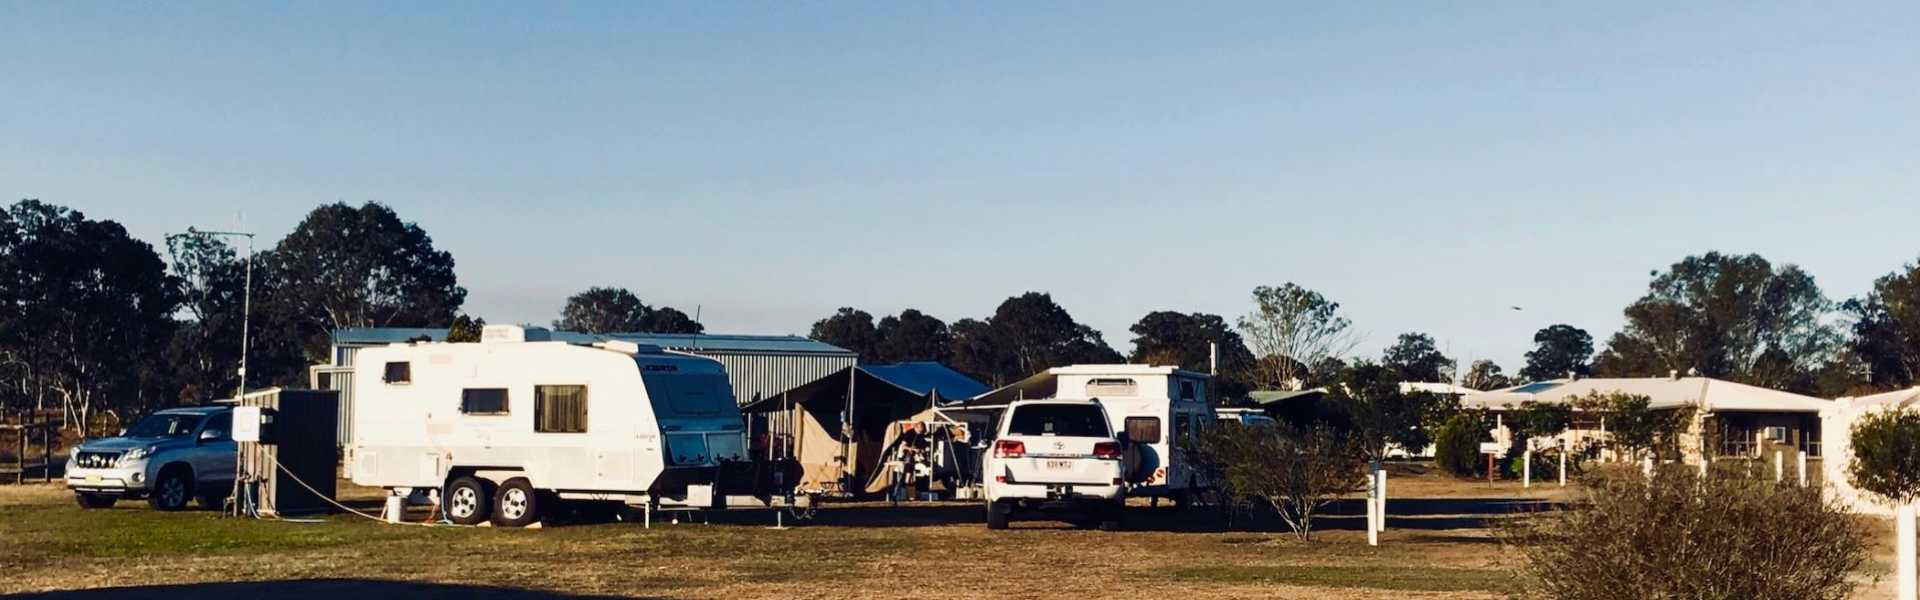 Kui Parks, Cheery Nomad RV Park & Farmstay, Maryborough, Sites